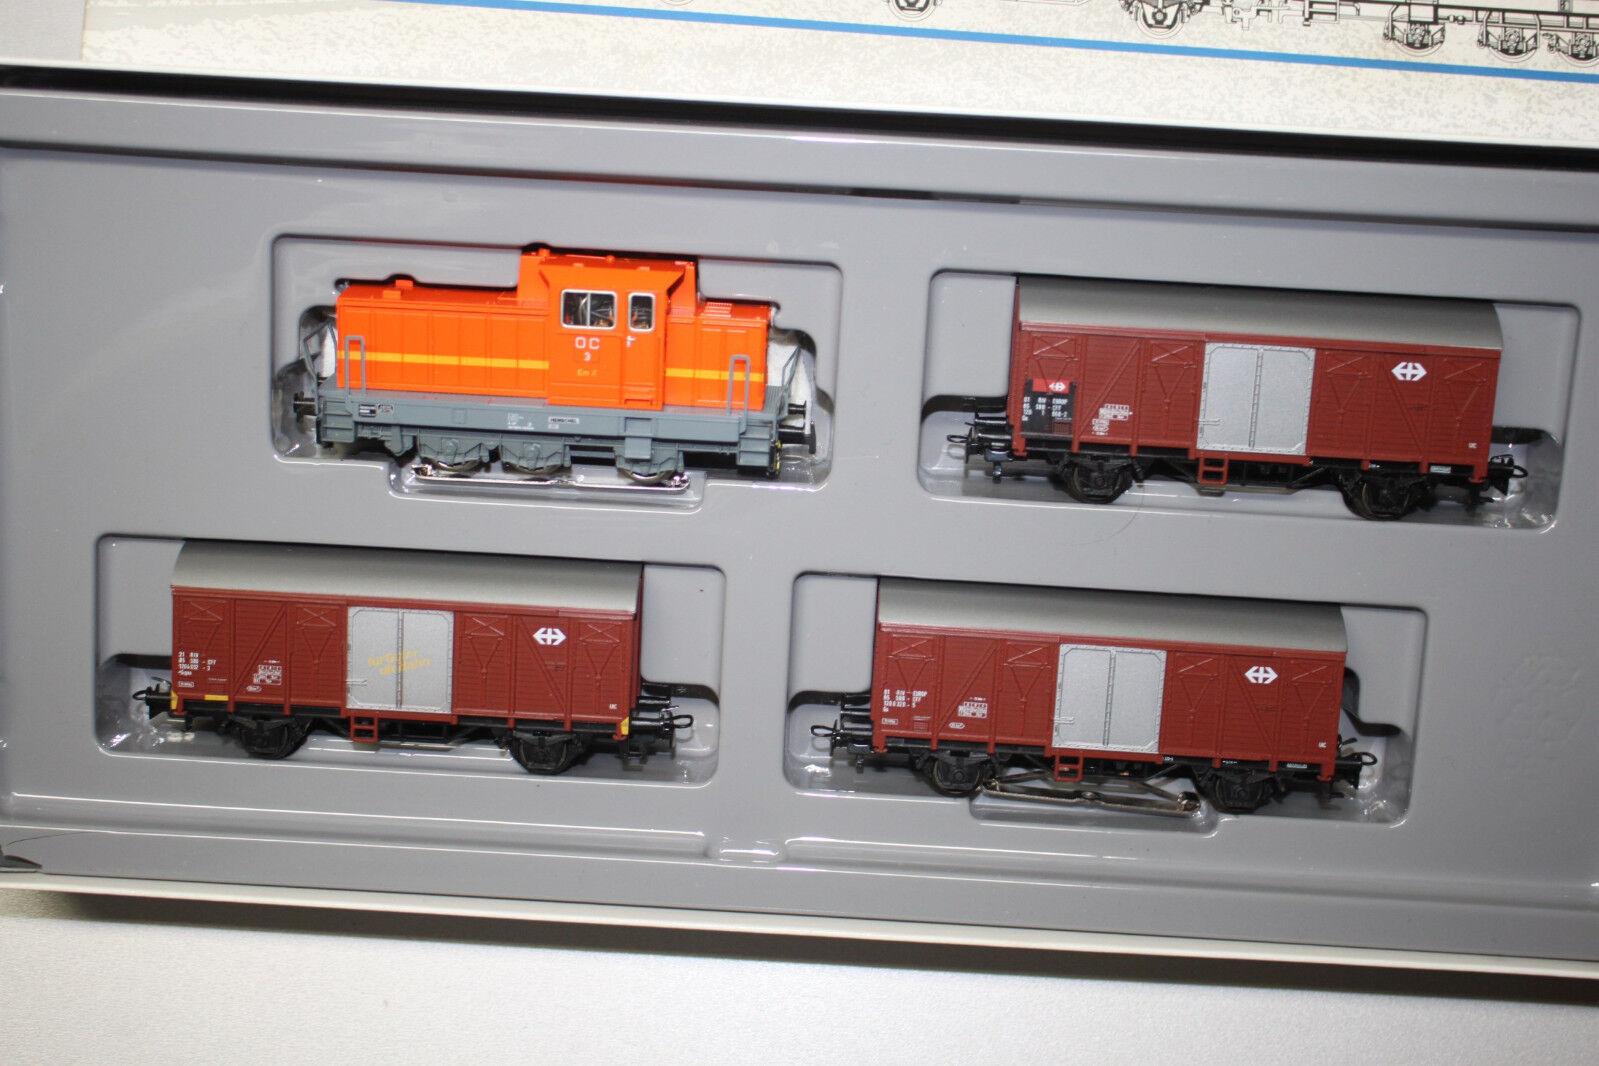 Märklin 2847 suizos junto a ferrocarril tren de carga pista h0 OVP